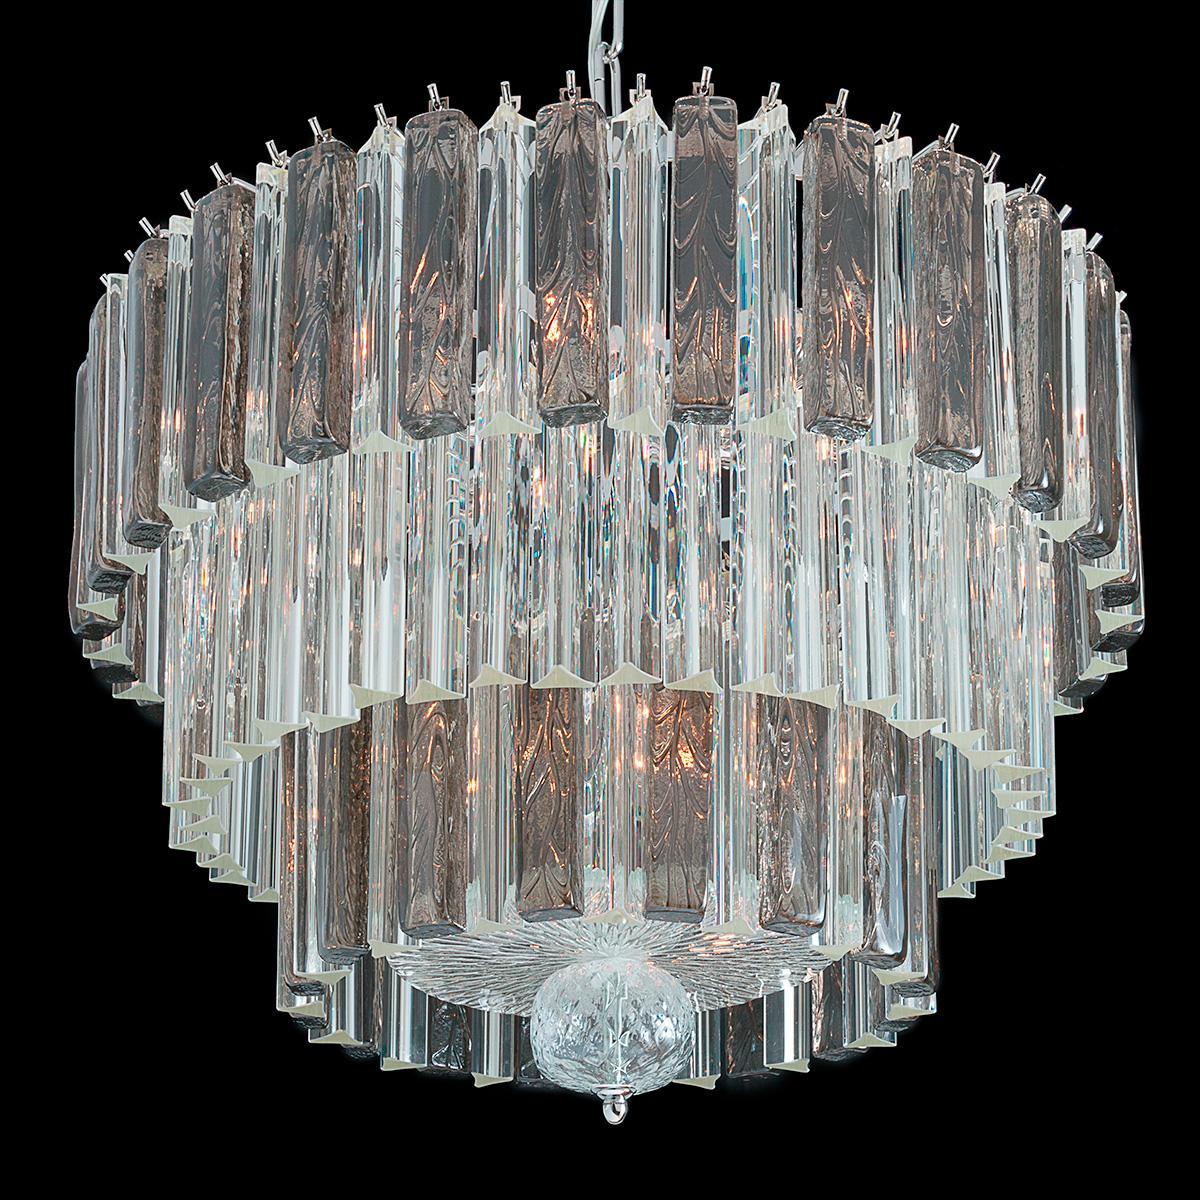 """Barry"" lampara de araña de Murano - 9 luces - transparente y gris"